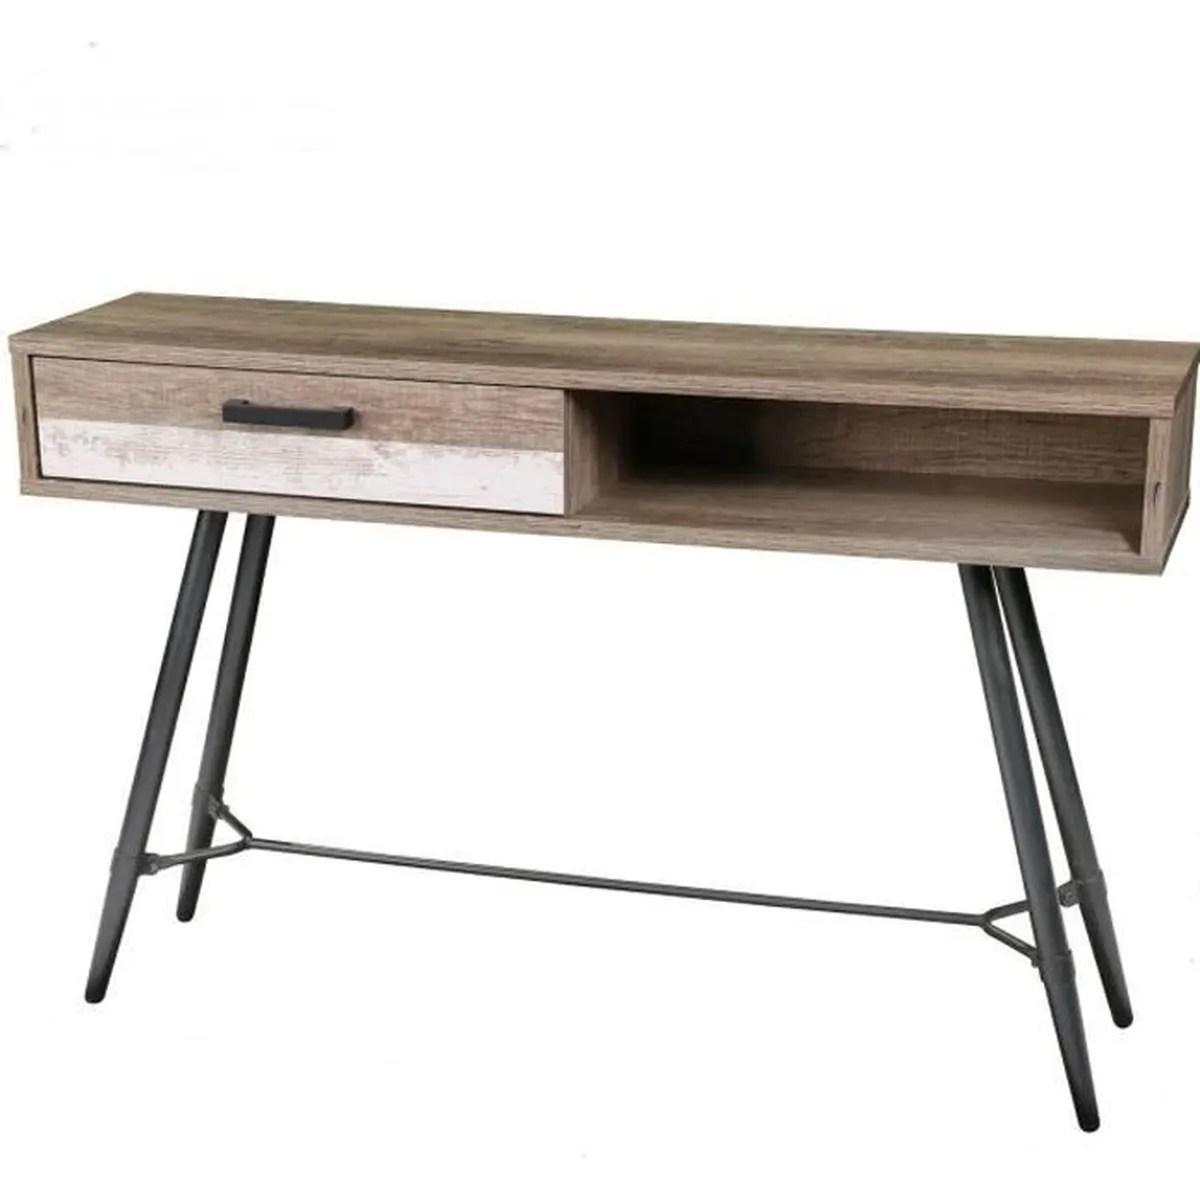 table salon basse tele retro console tv bois metal industriel design entree